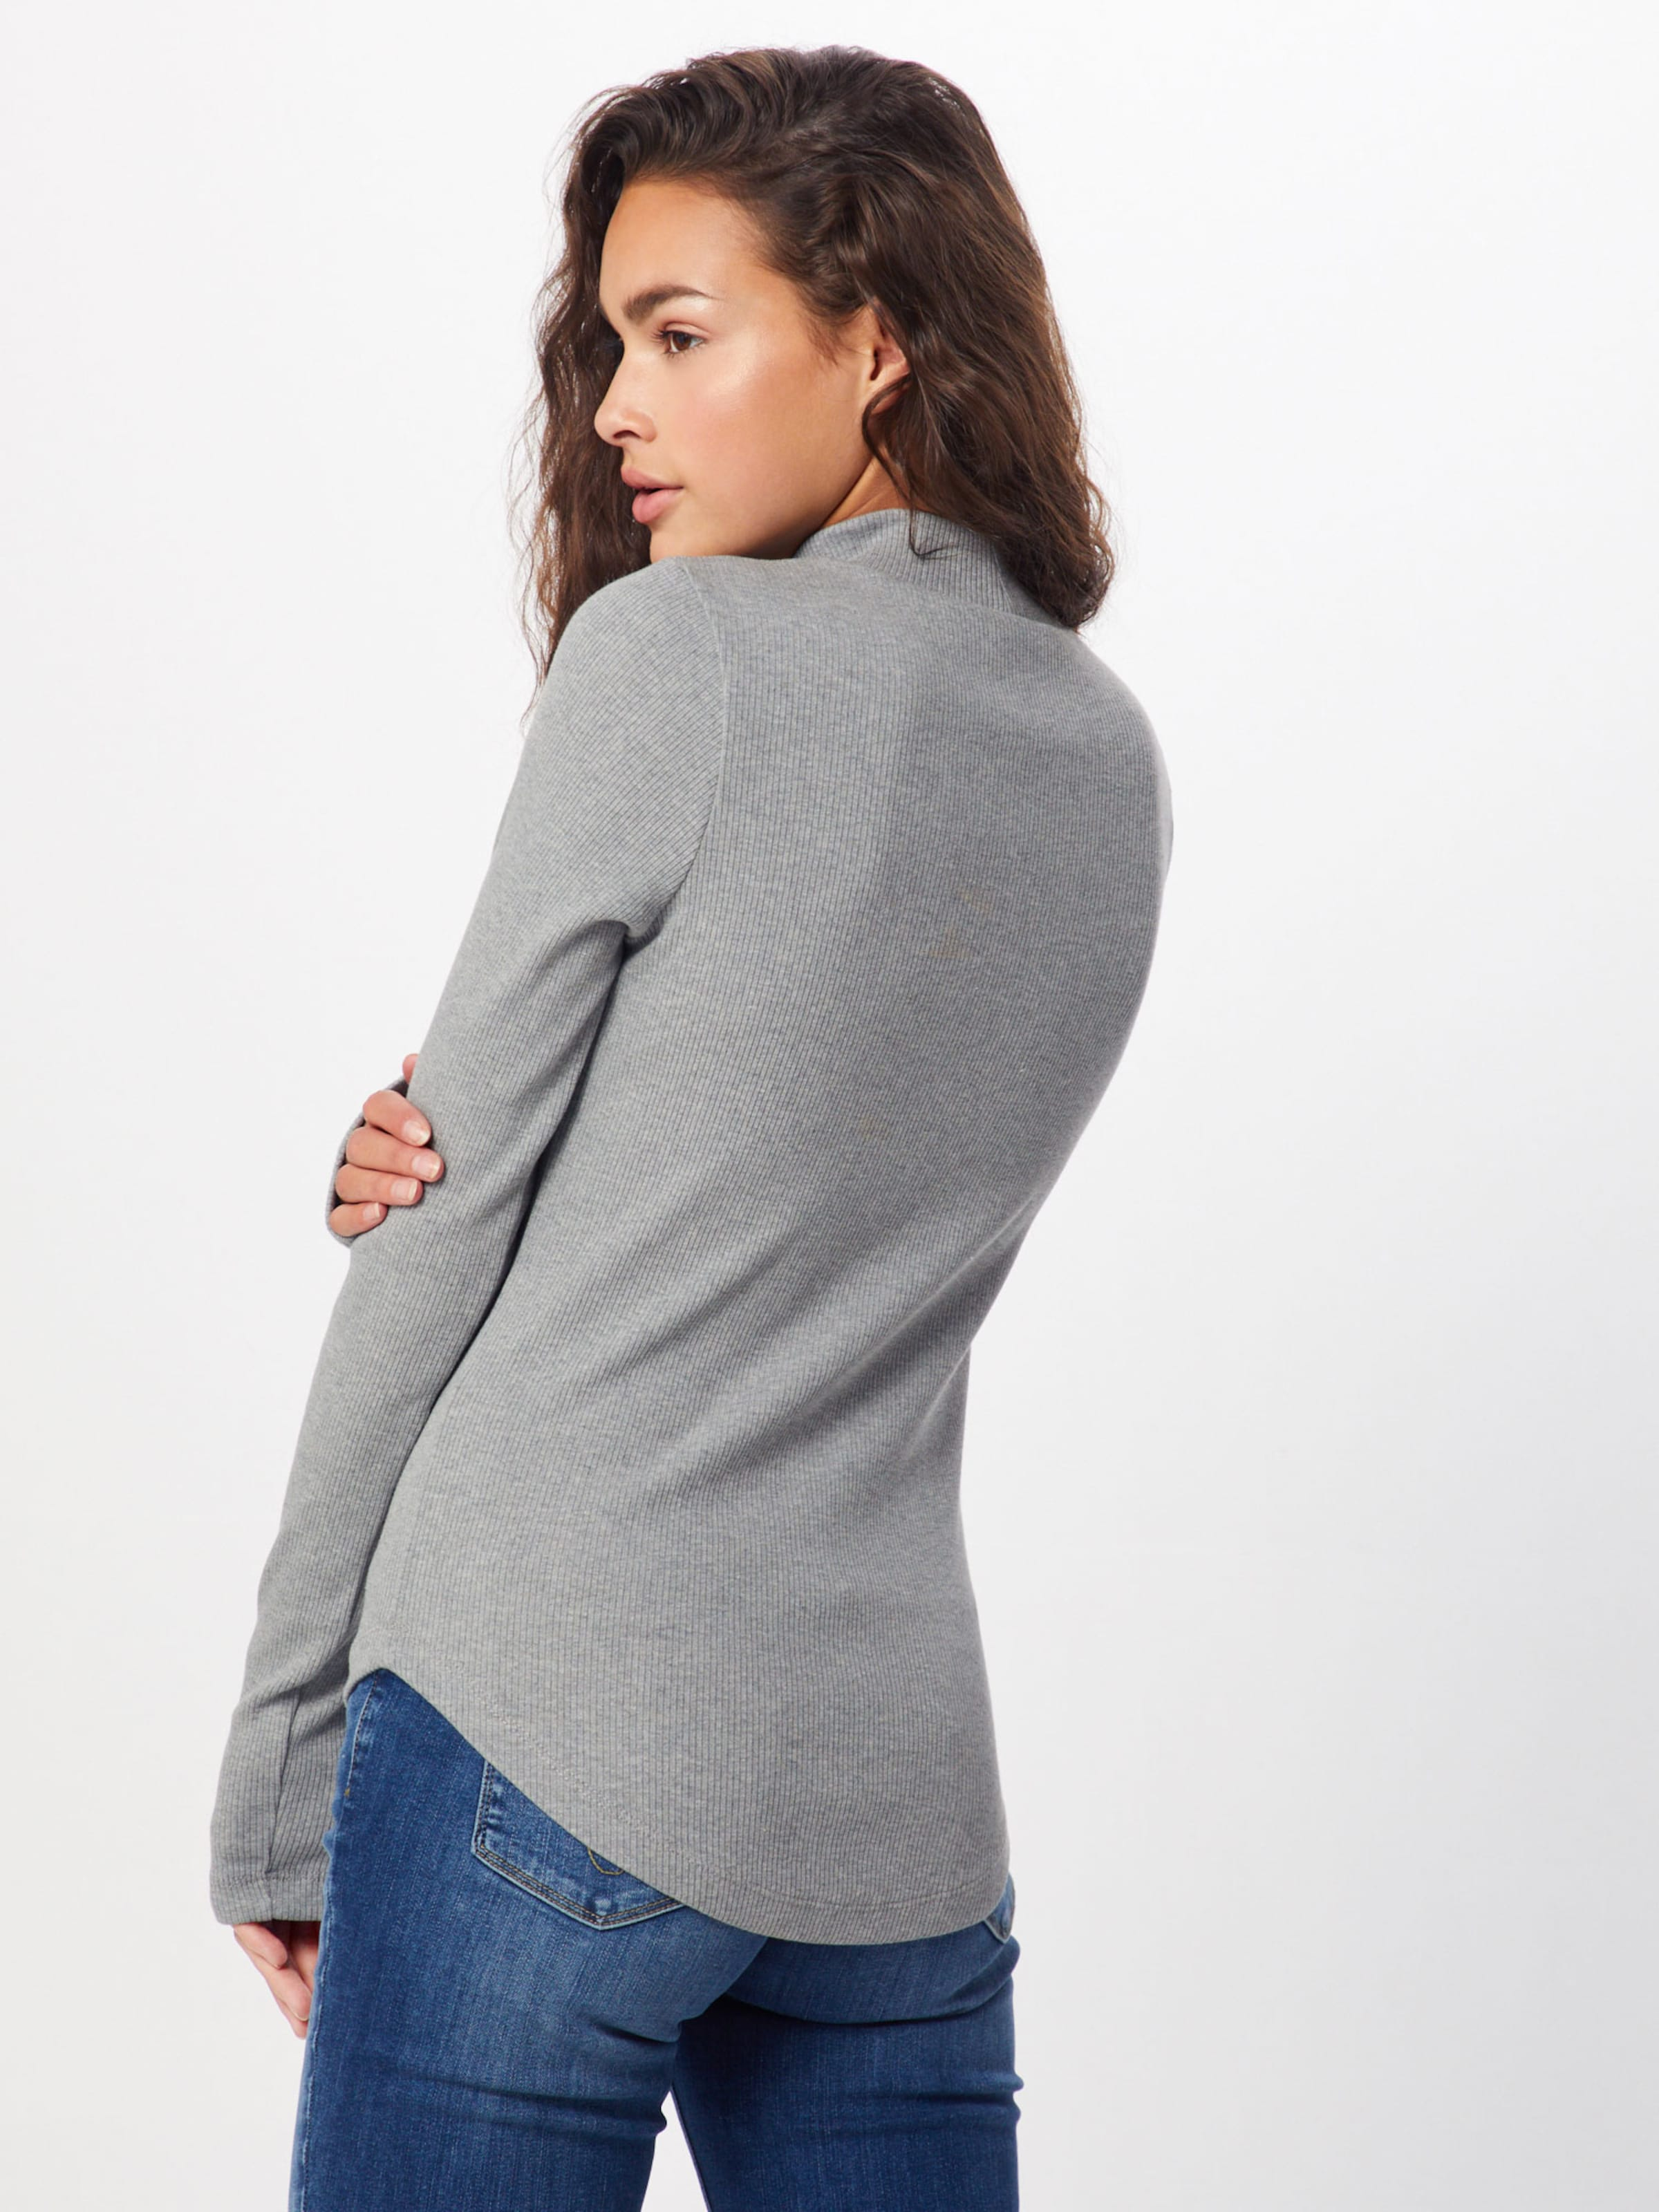 Pullover Calvin Calvin Klein Grau In kiuOZlwPXT